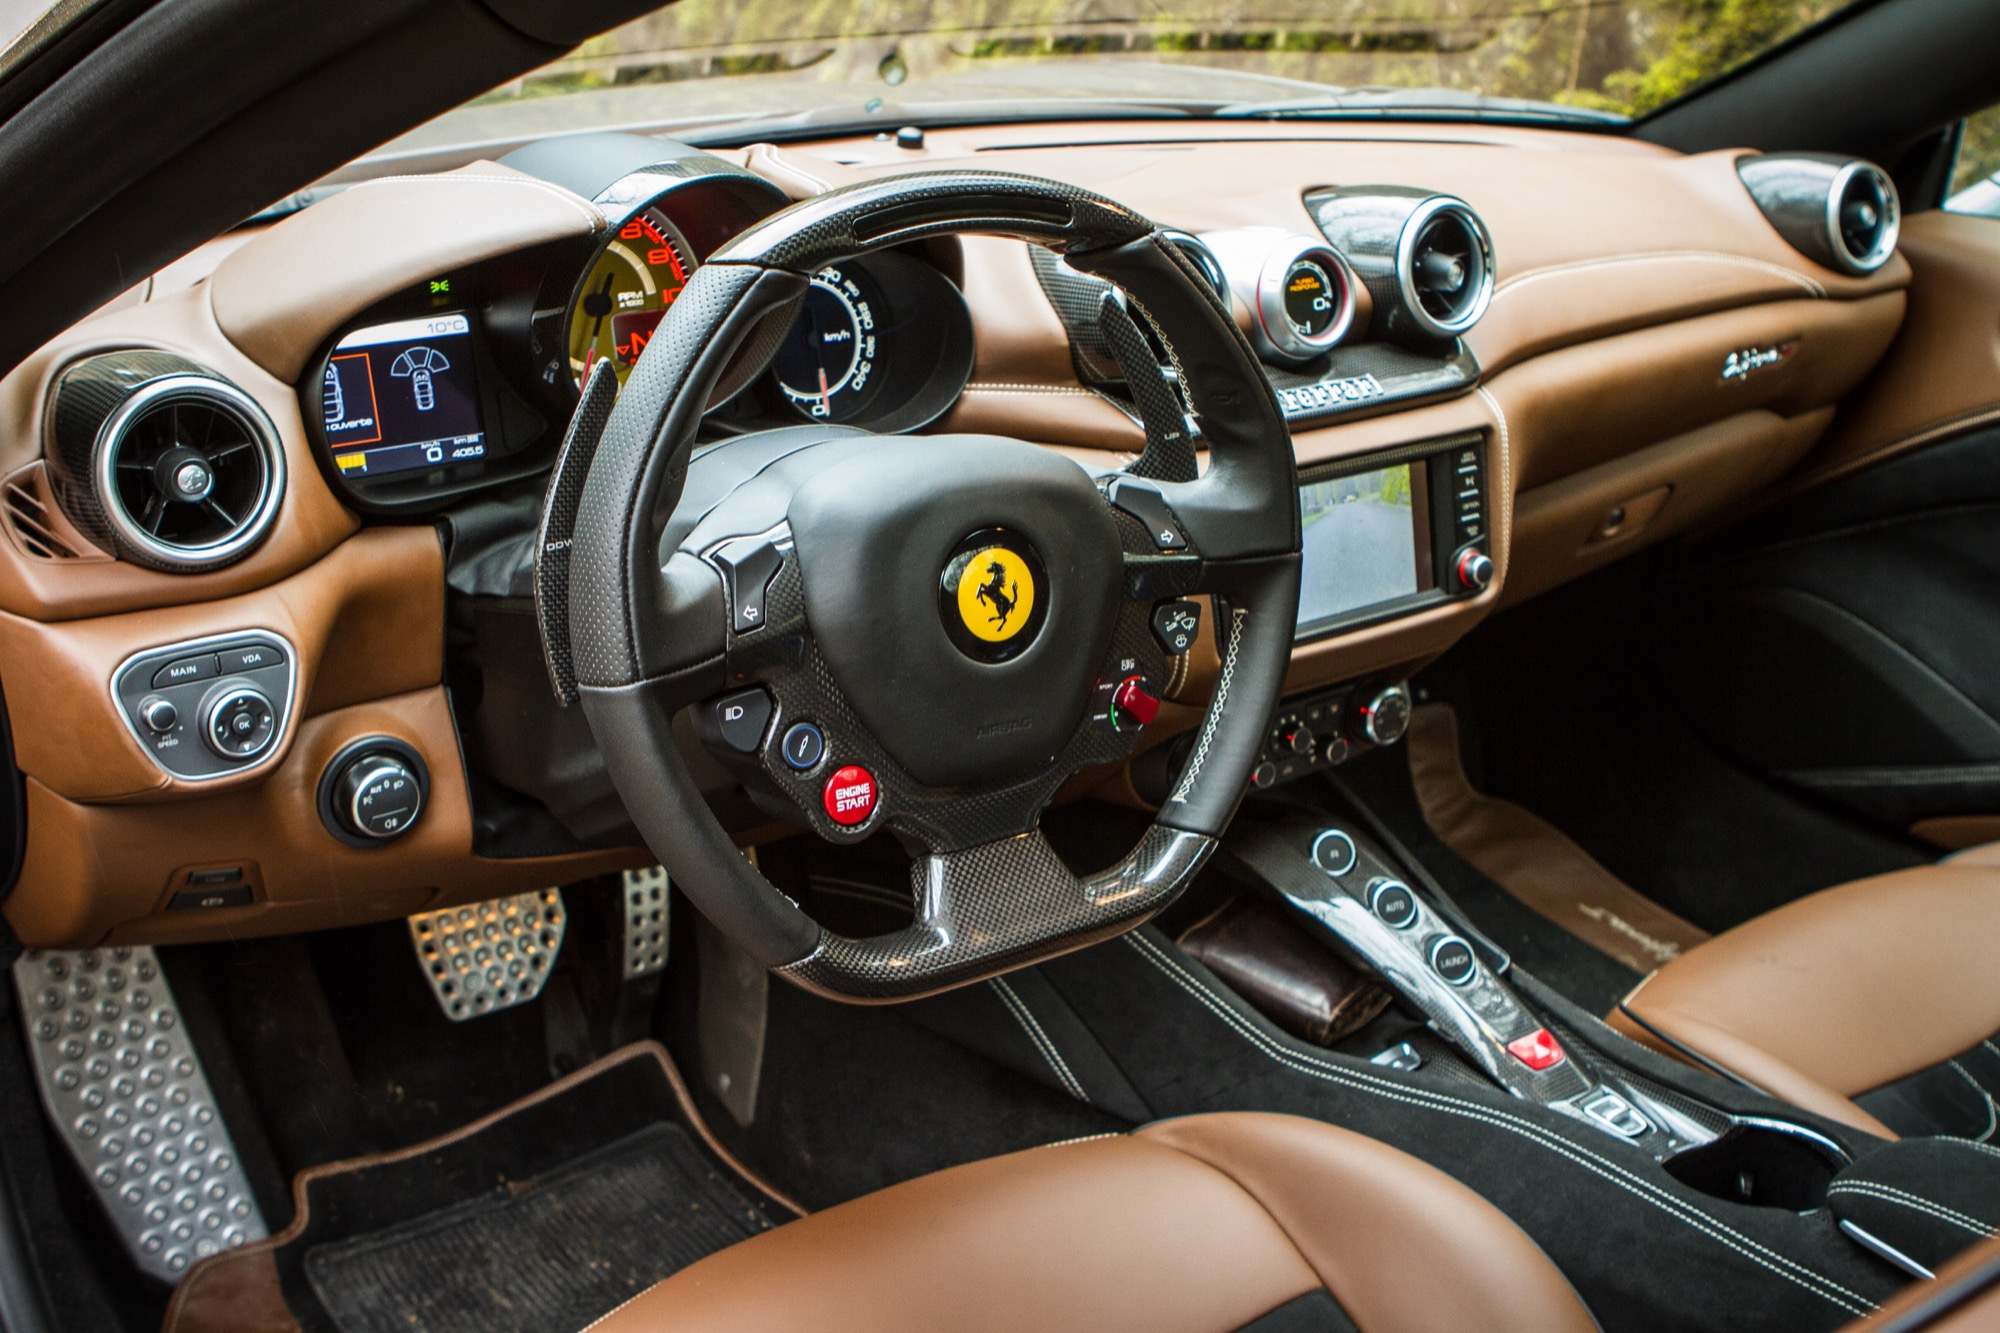 La ferrari california t l 39 essai sur les routes burgondes for Ferrari california t interieur